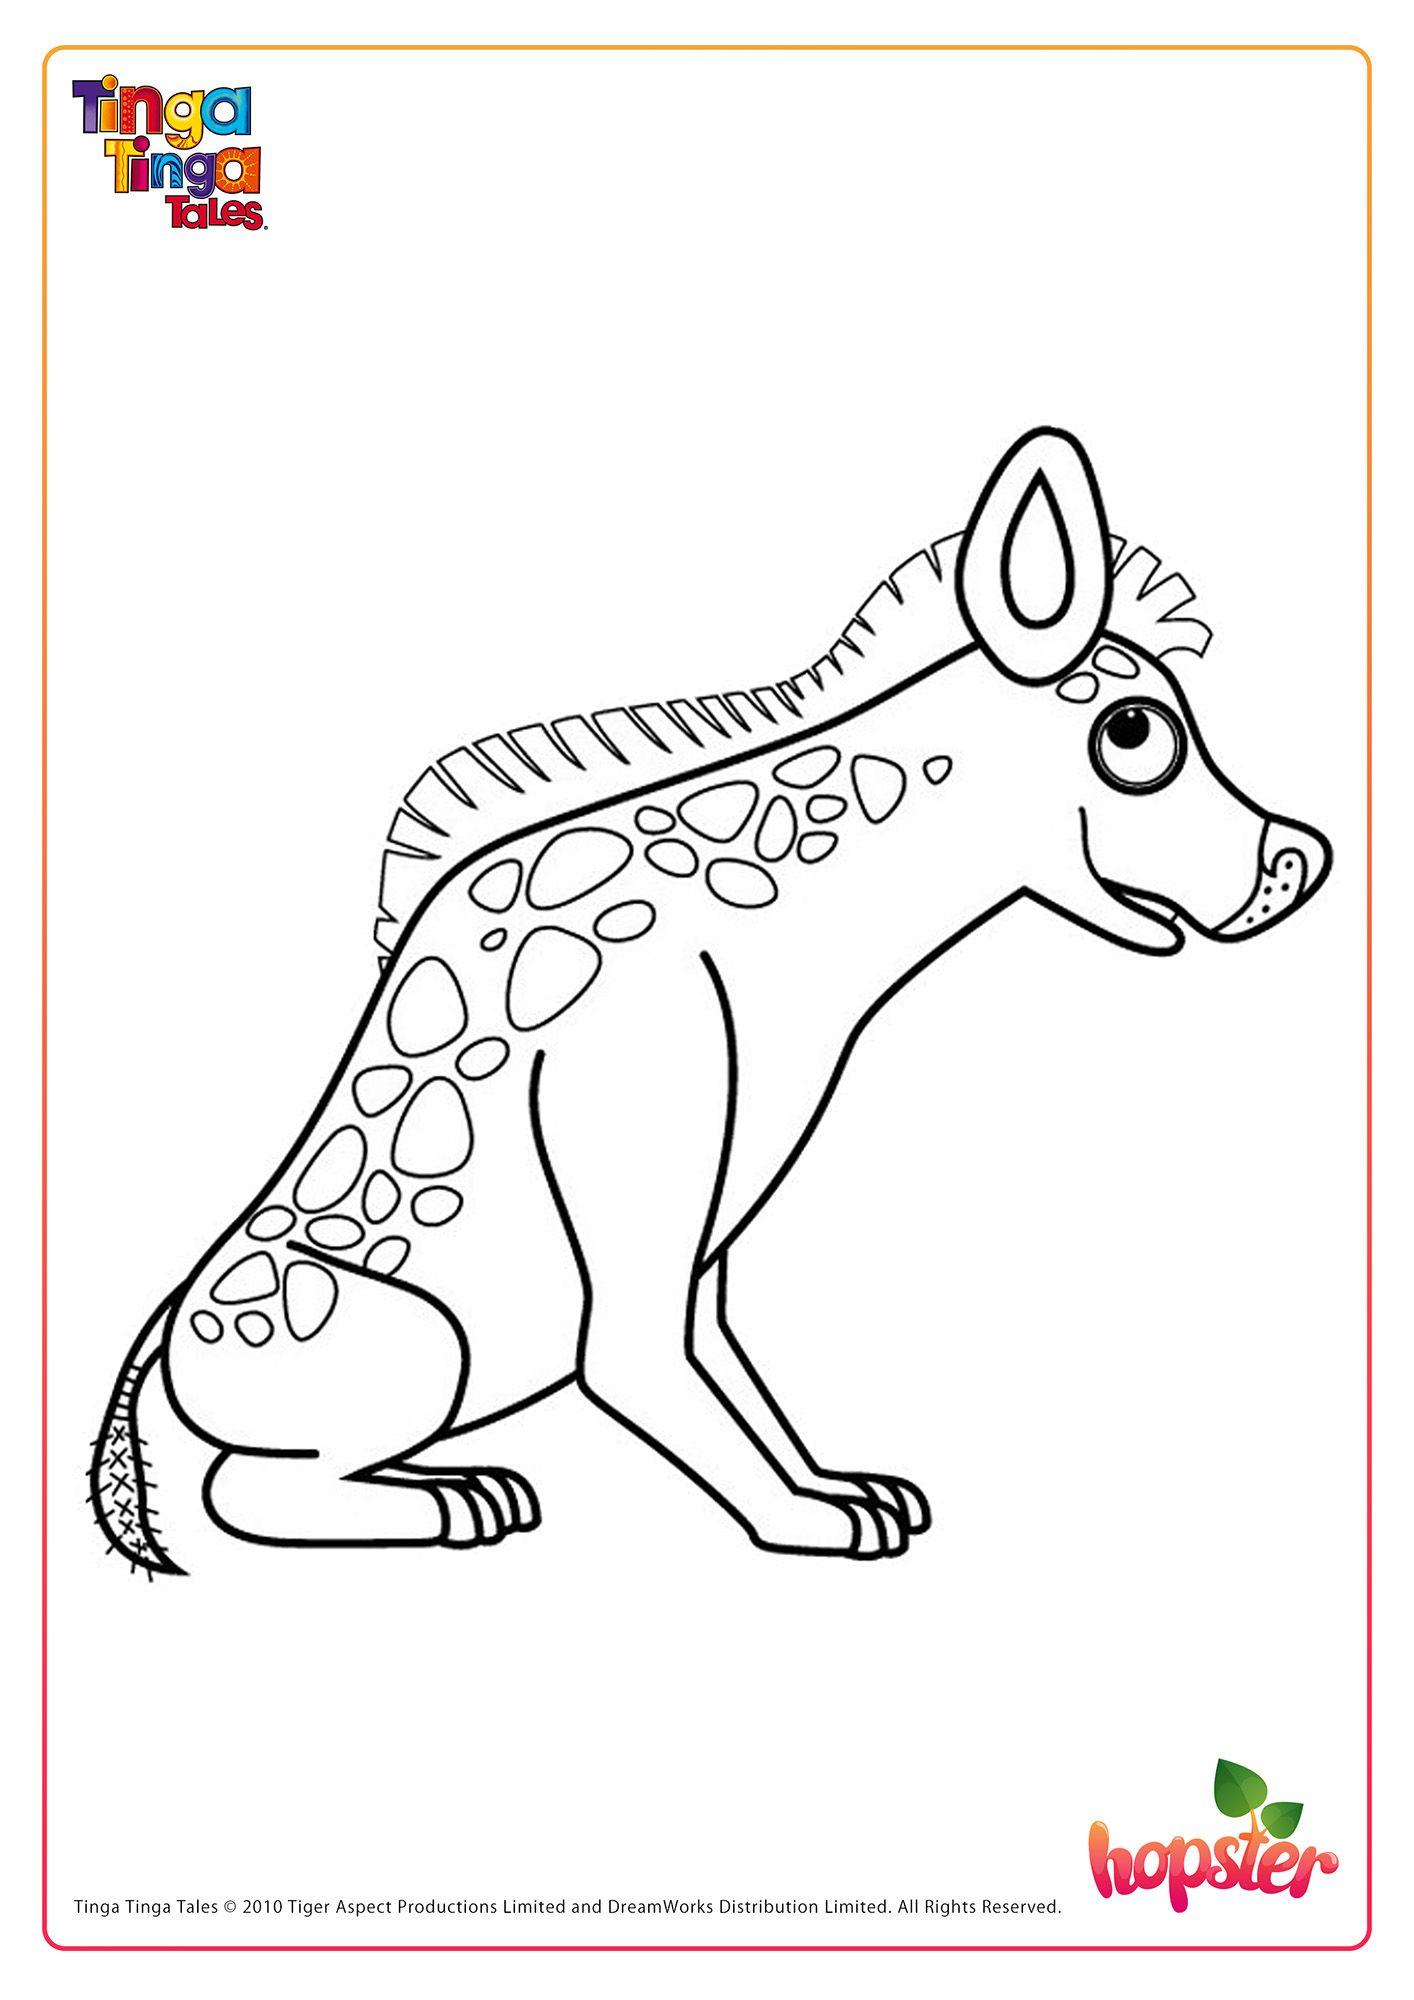 This Is Hyena From Tinga Tinga Tales Colour Him In Fun Printables For Kids Kids Tv Free Kids [ 2000 x 1414 Pixel ]